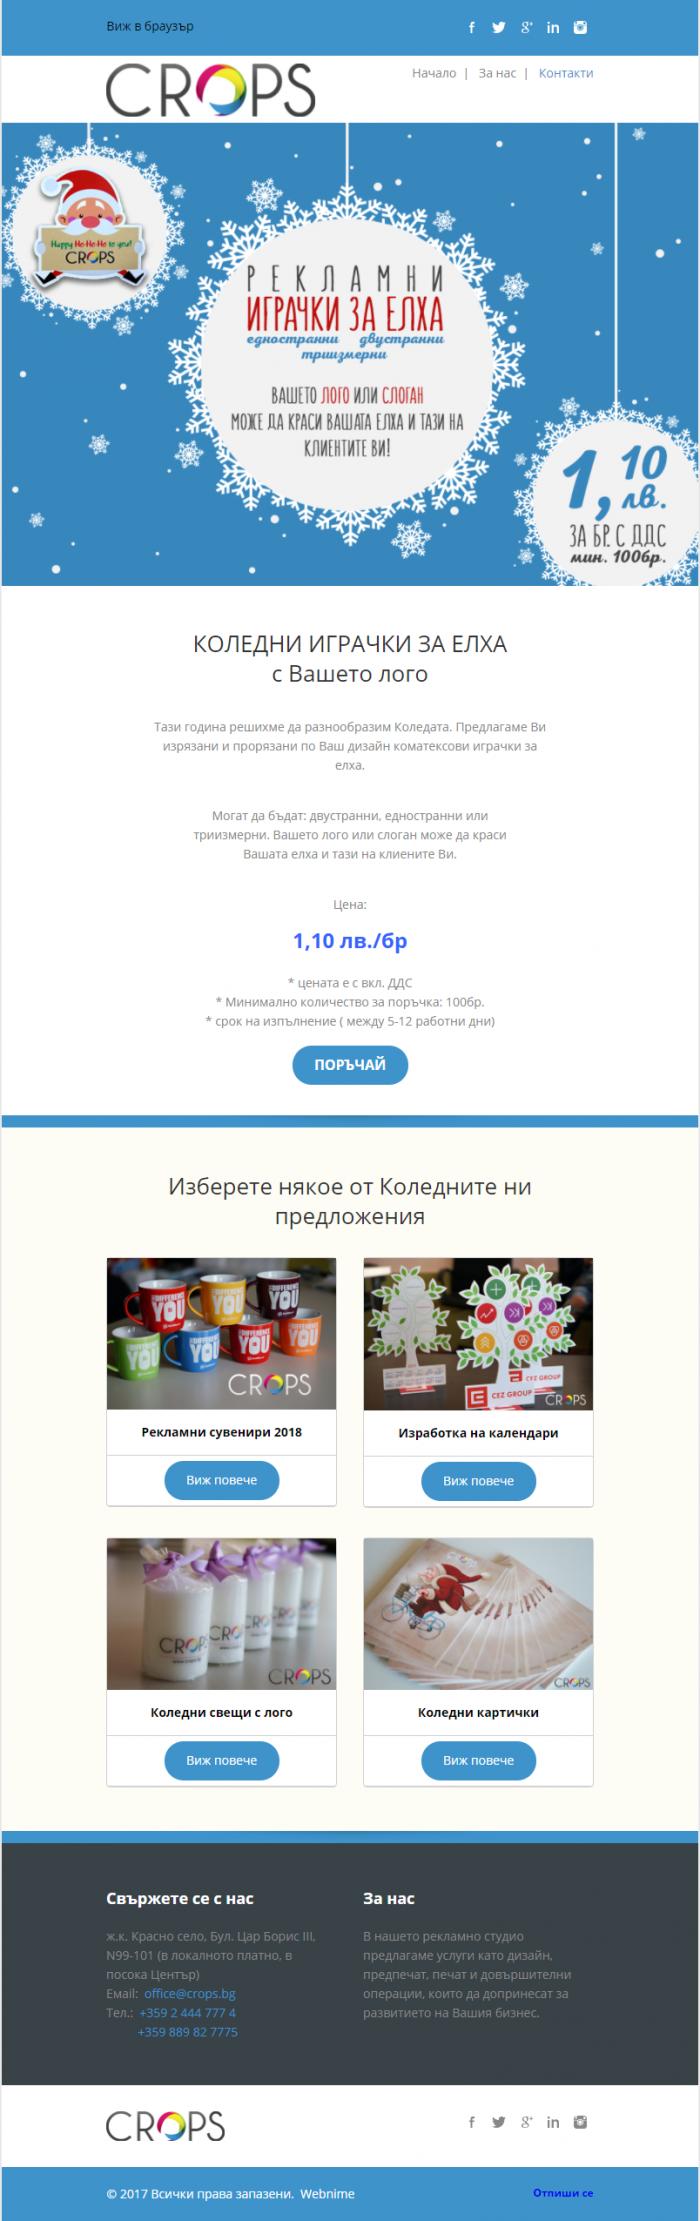 Имейл маркетинг - играчки за елха, https://webnime.com/